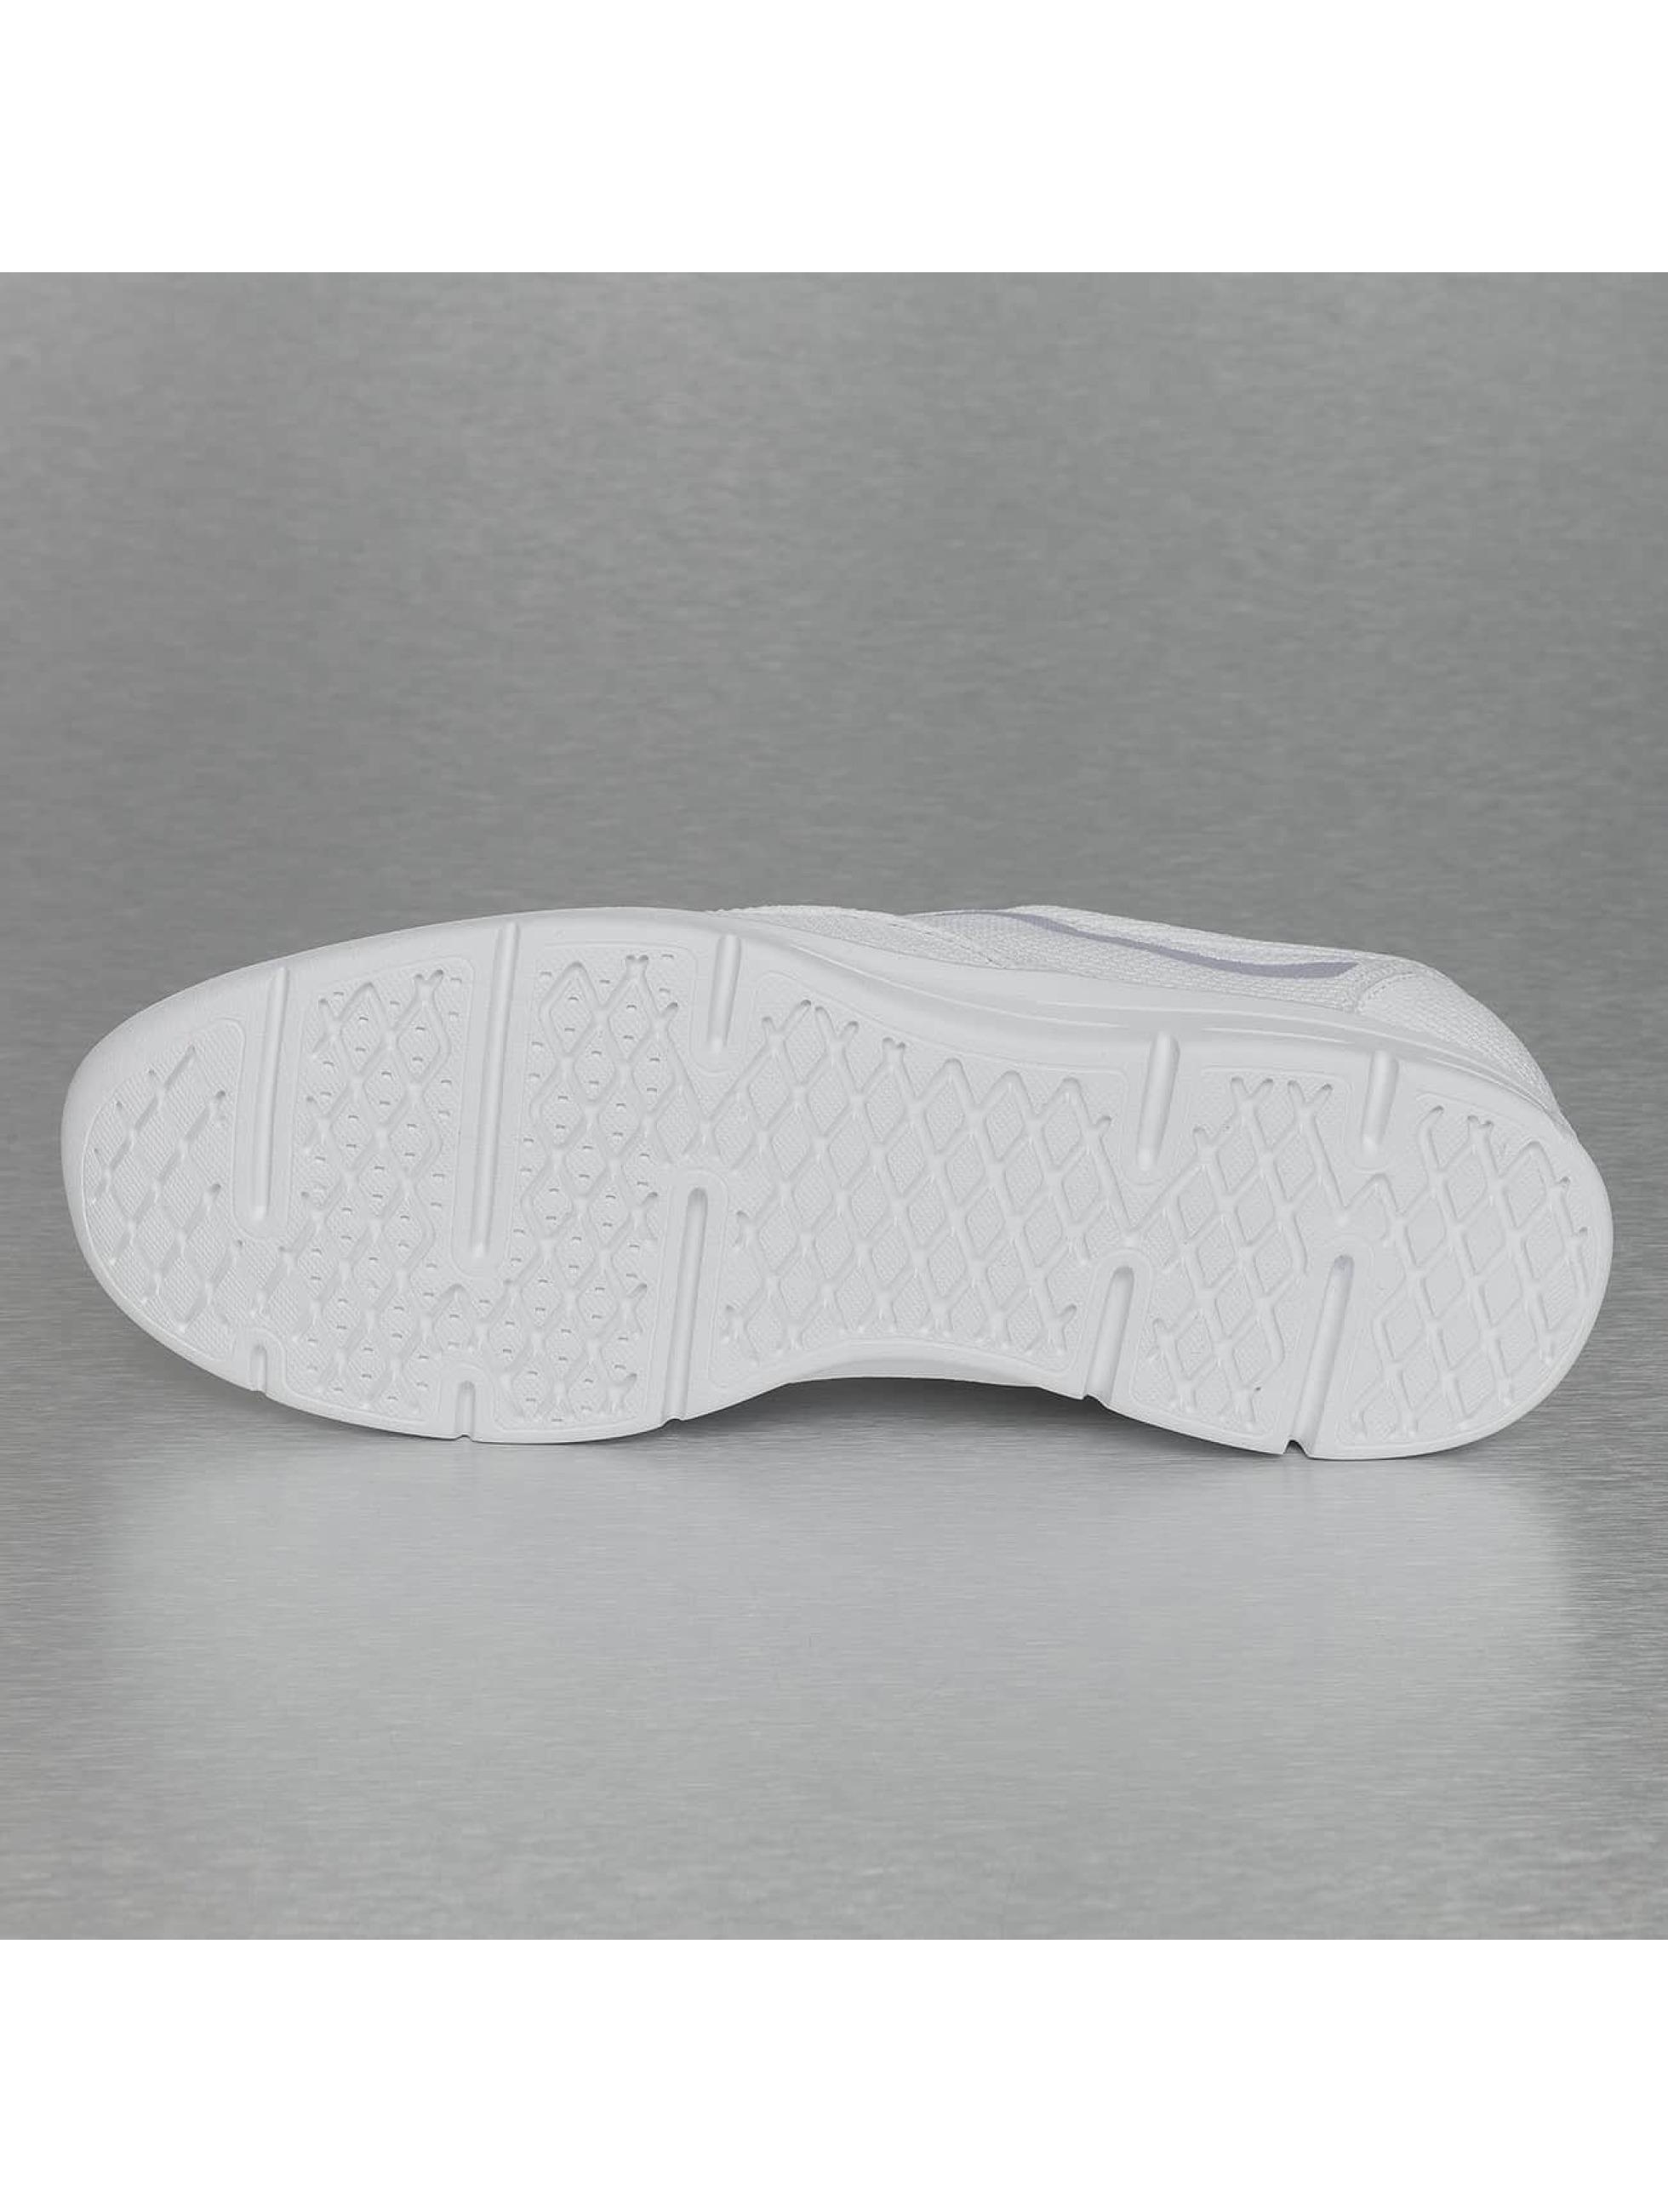 Vans Tøysko Iso 1.5 hvit